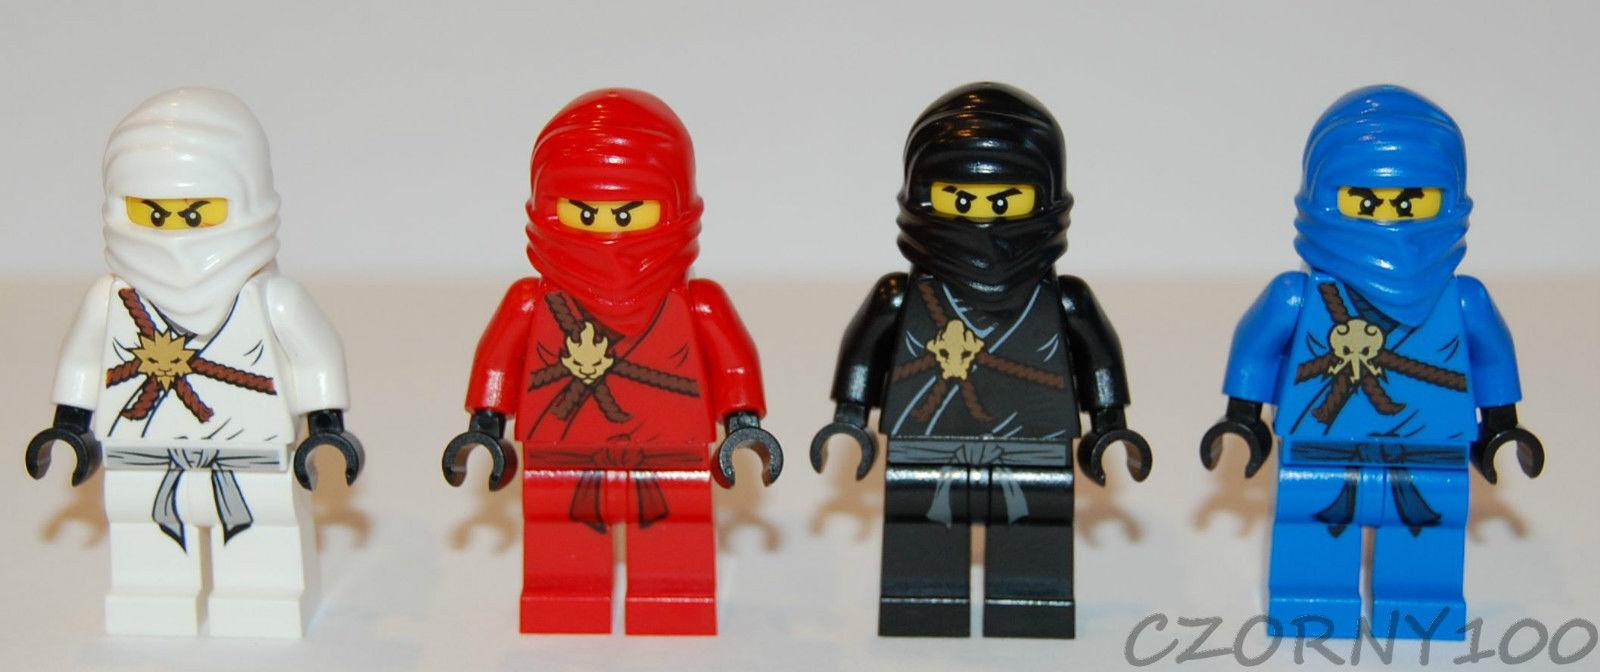 LEGO NINJAGO KAI   COLE     ZANE   JAY MINIFIGURES LOT OF 4 NEW 9d13a2